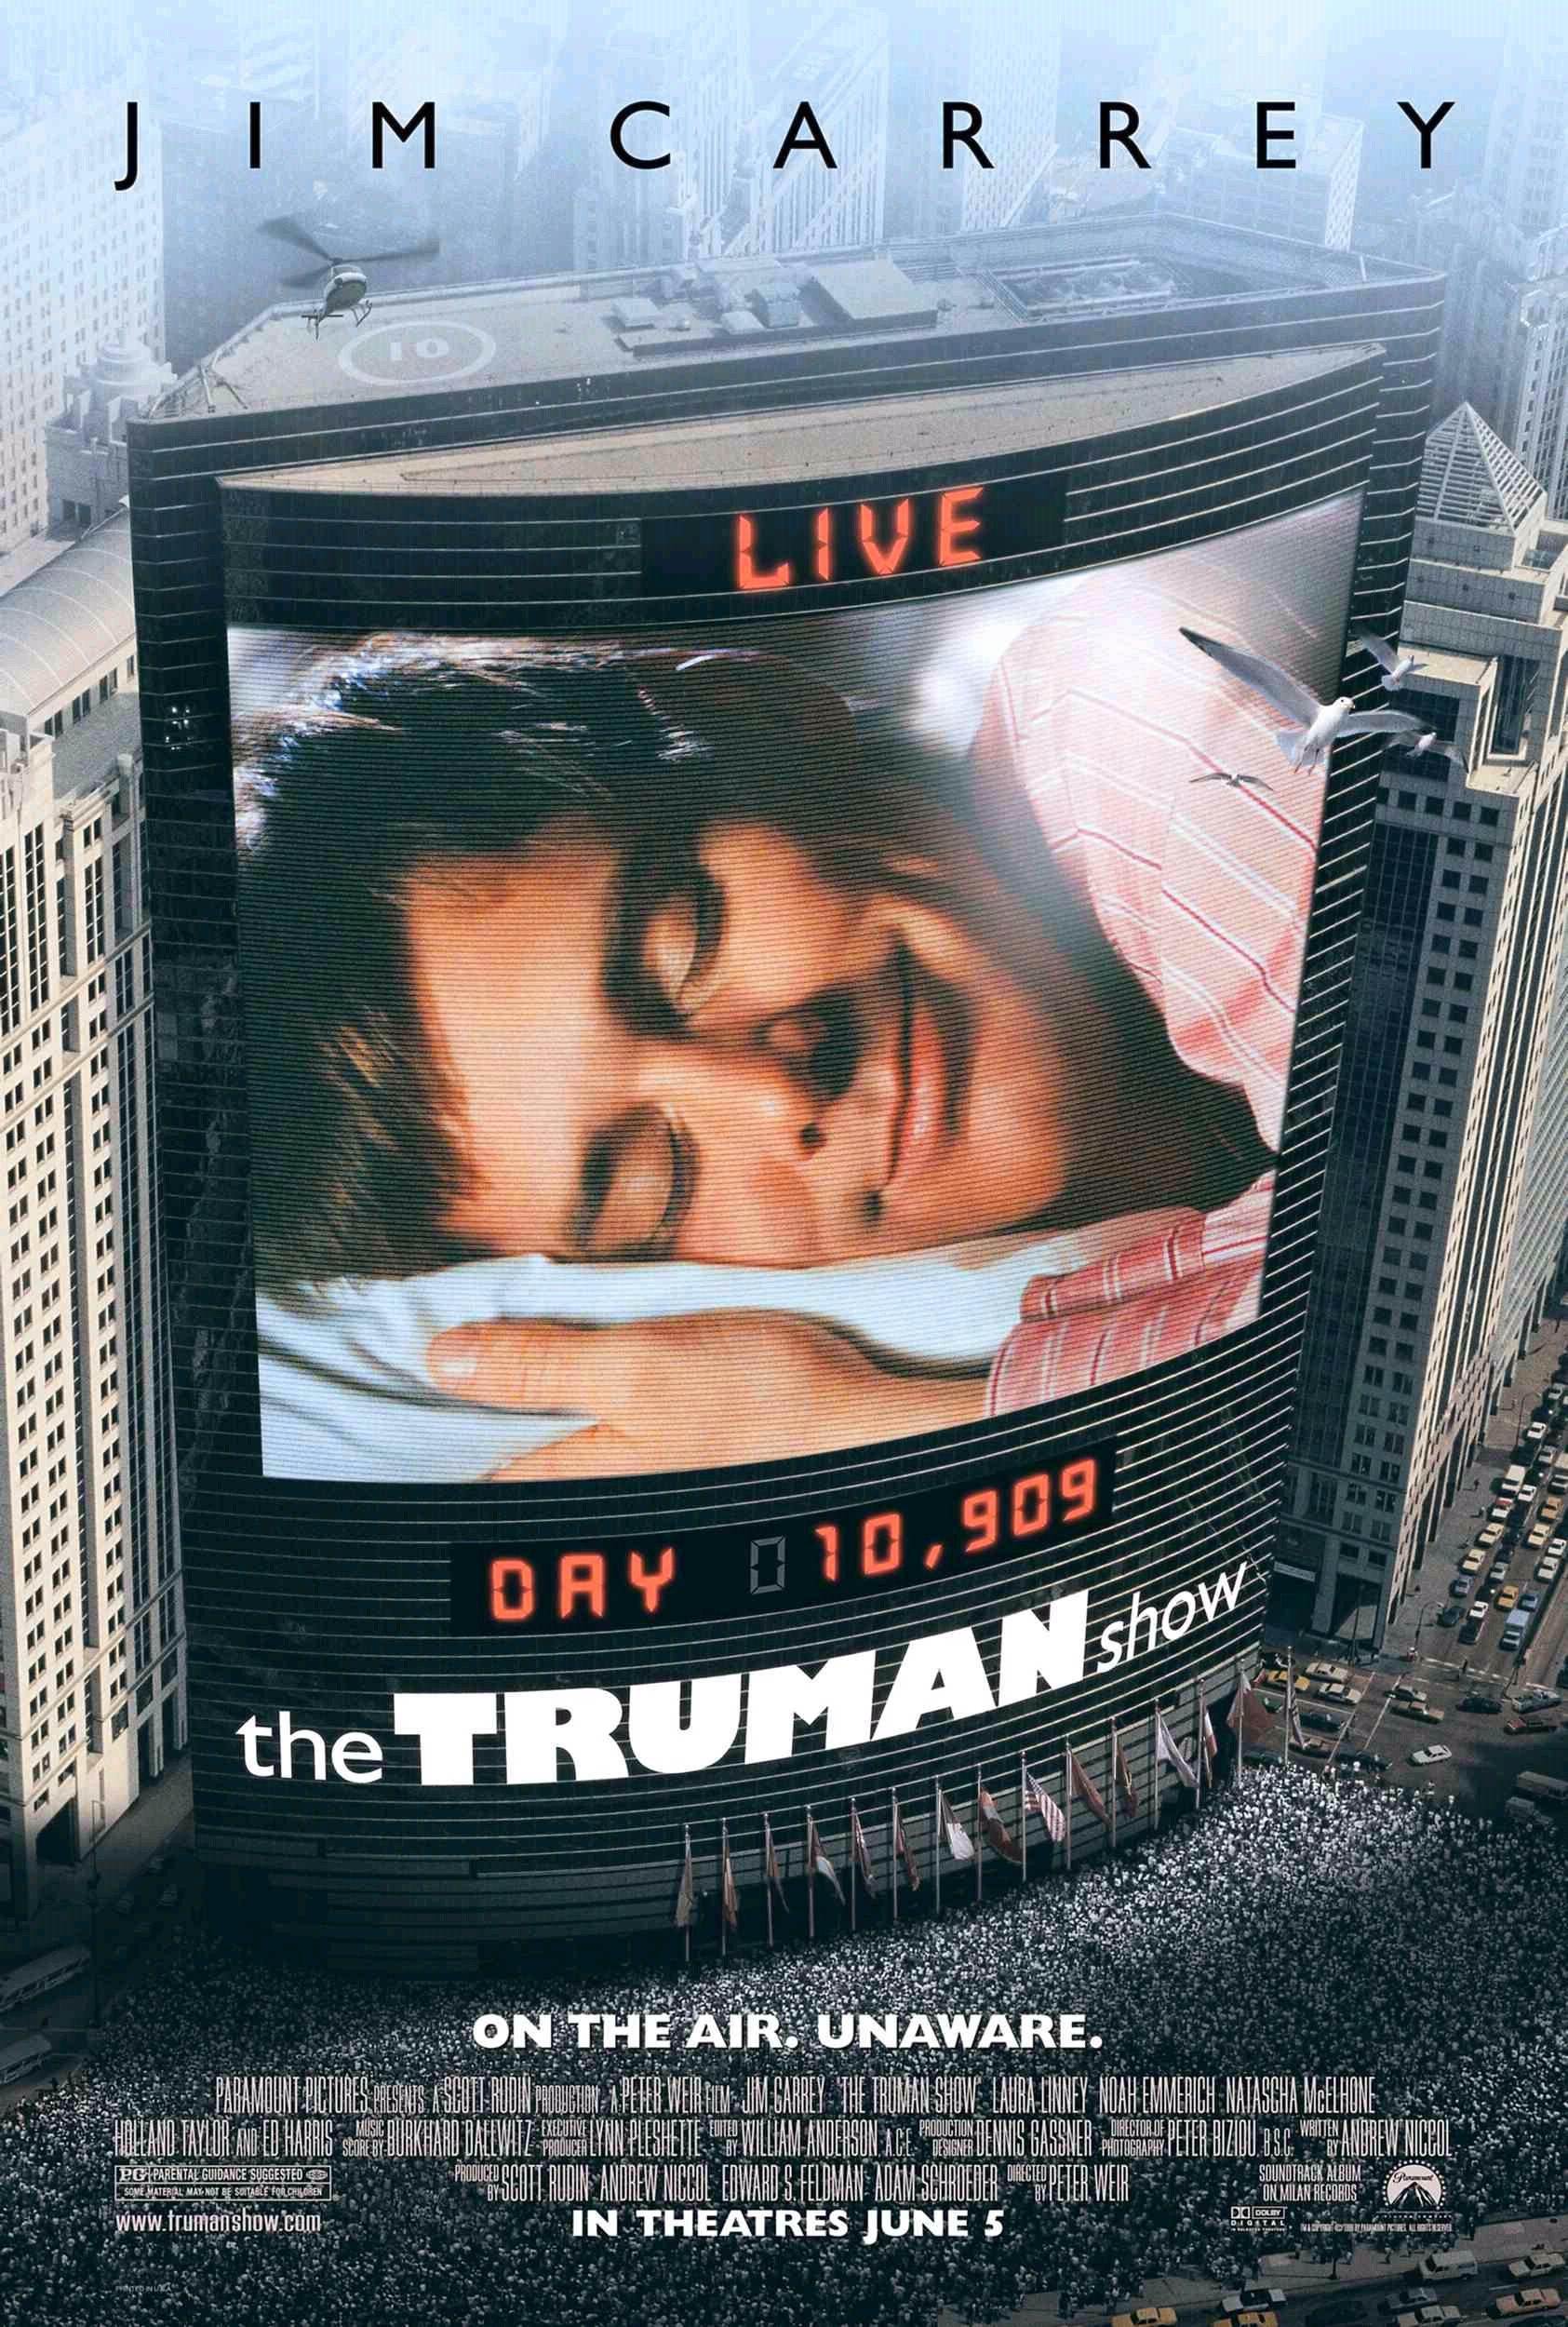 the truman show movie